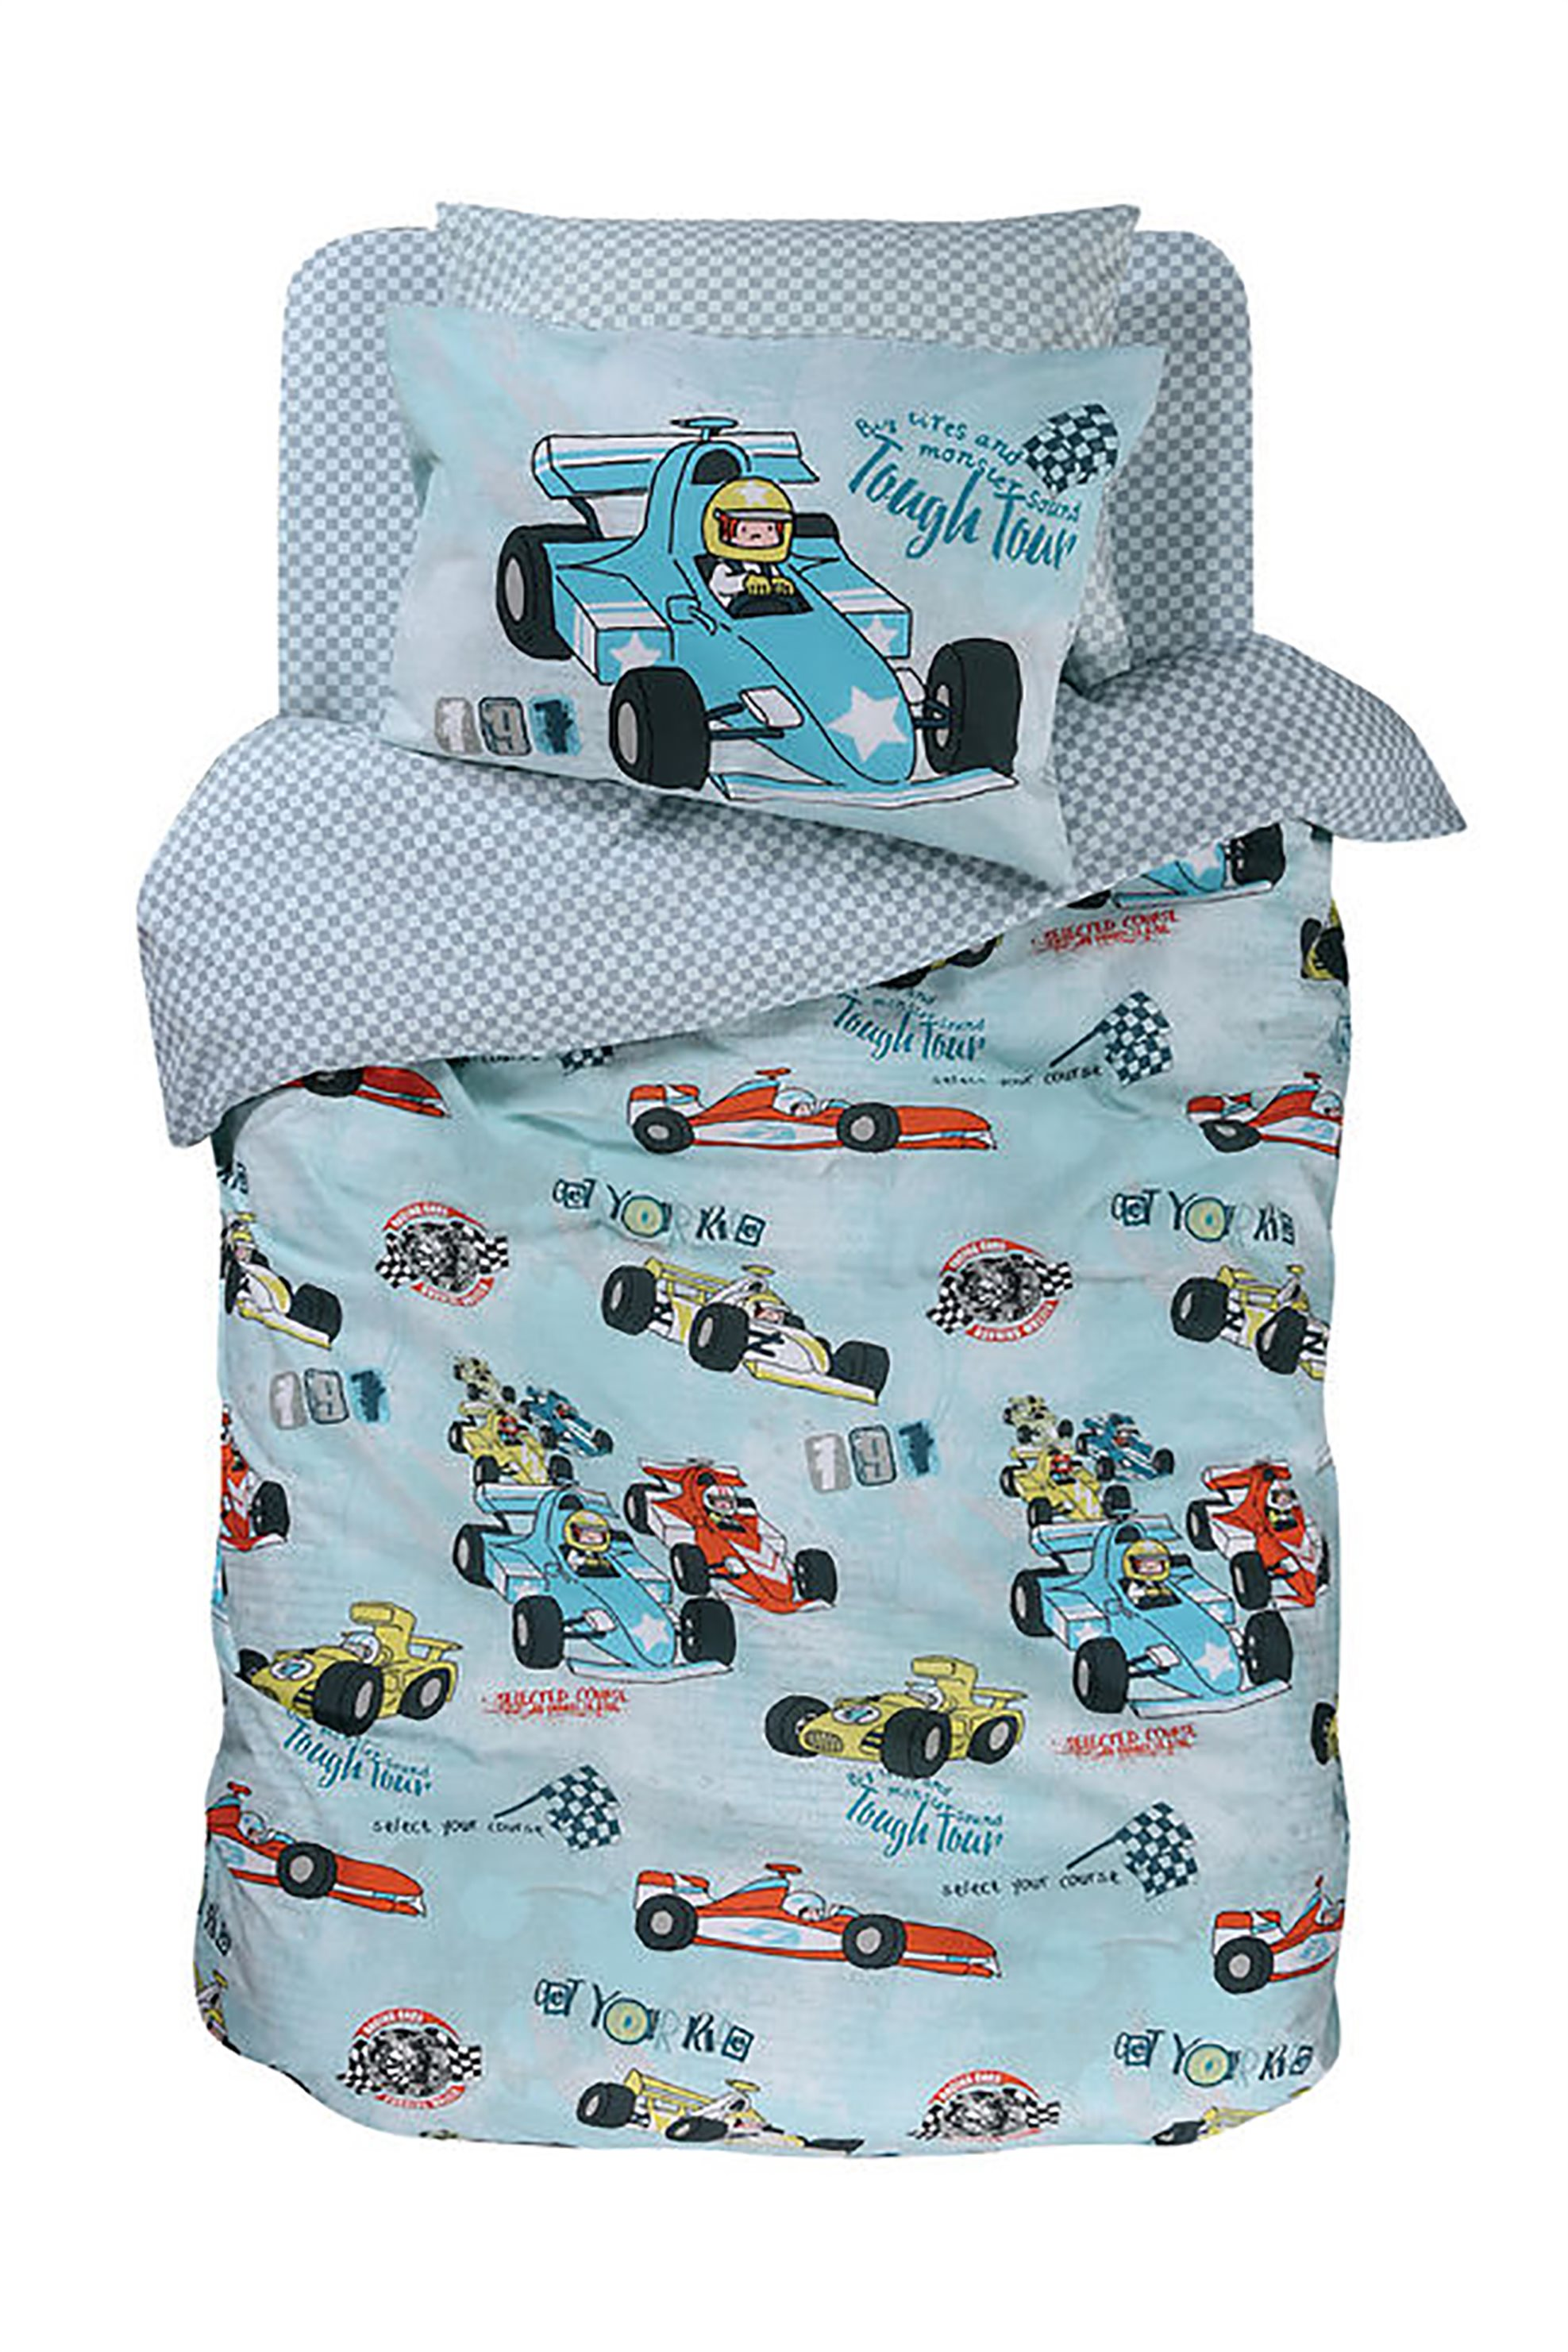 NEF-NEF Σετ παιδική παπλωματοθήκη Racing Car (2 τεμάχια)  - 022279 - Μπλε Ανοιχ home   παιδια   παπλωματοθήκες   σετ παιδικές παπλωματοθήκες